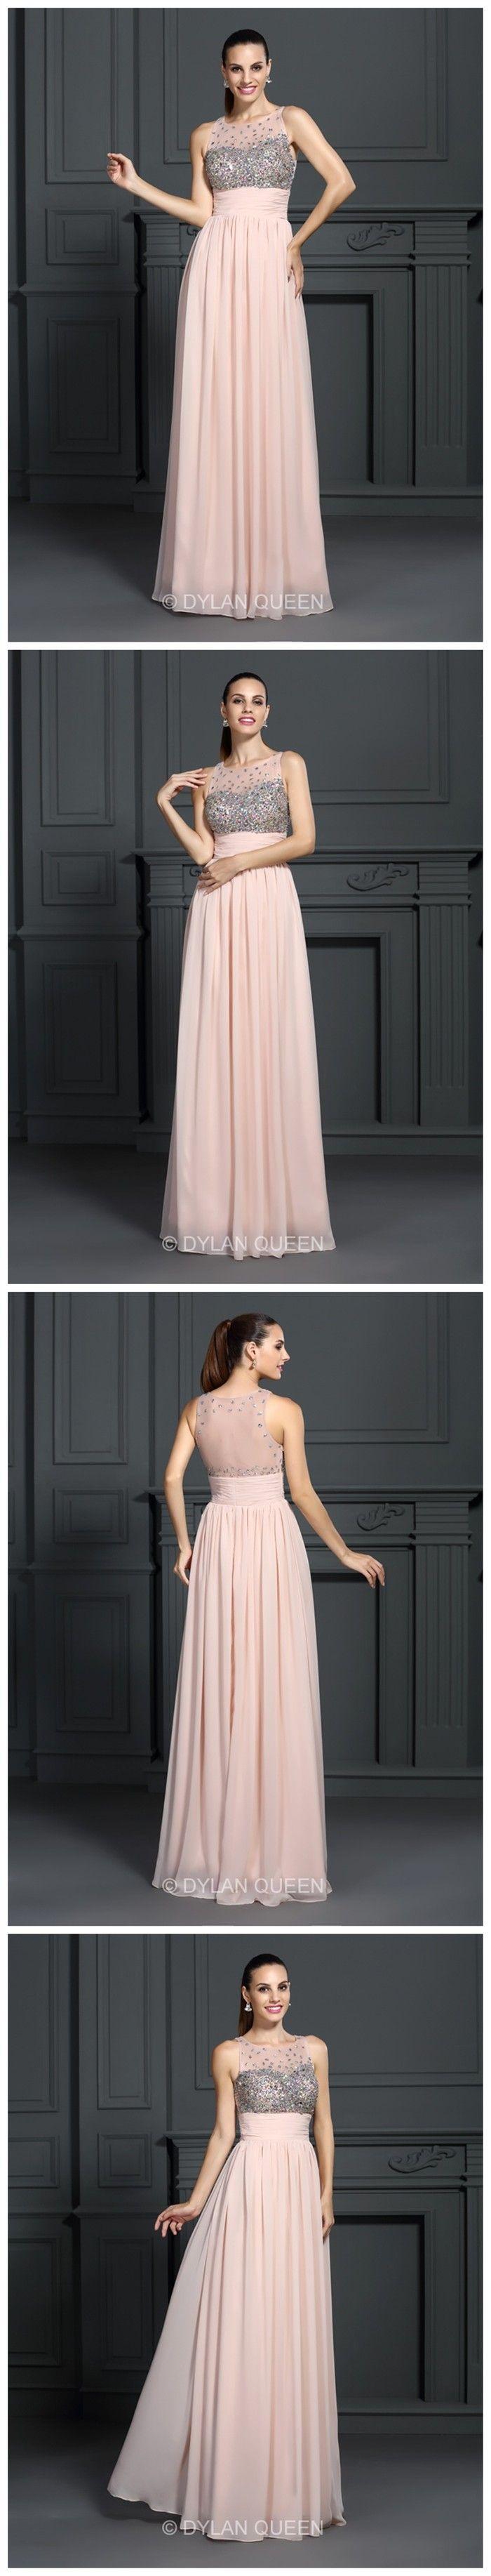 Pink evening dress.Floor-Length Long Dresses #DylanQueen